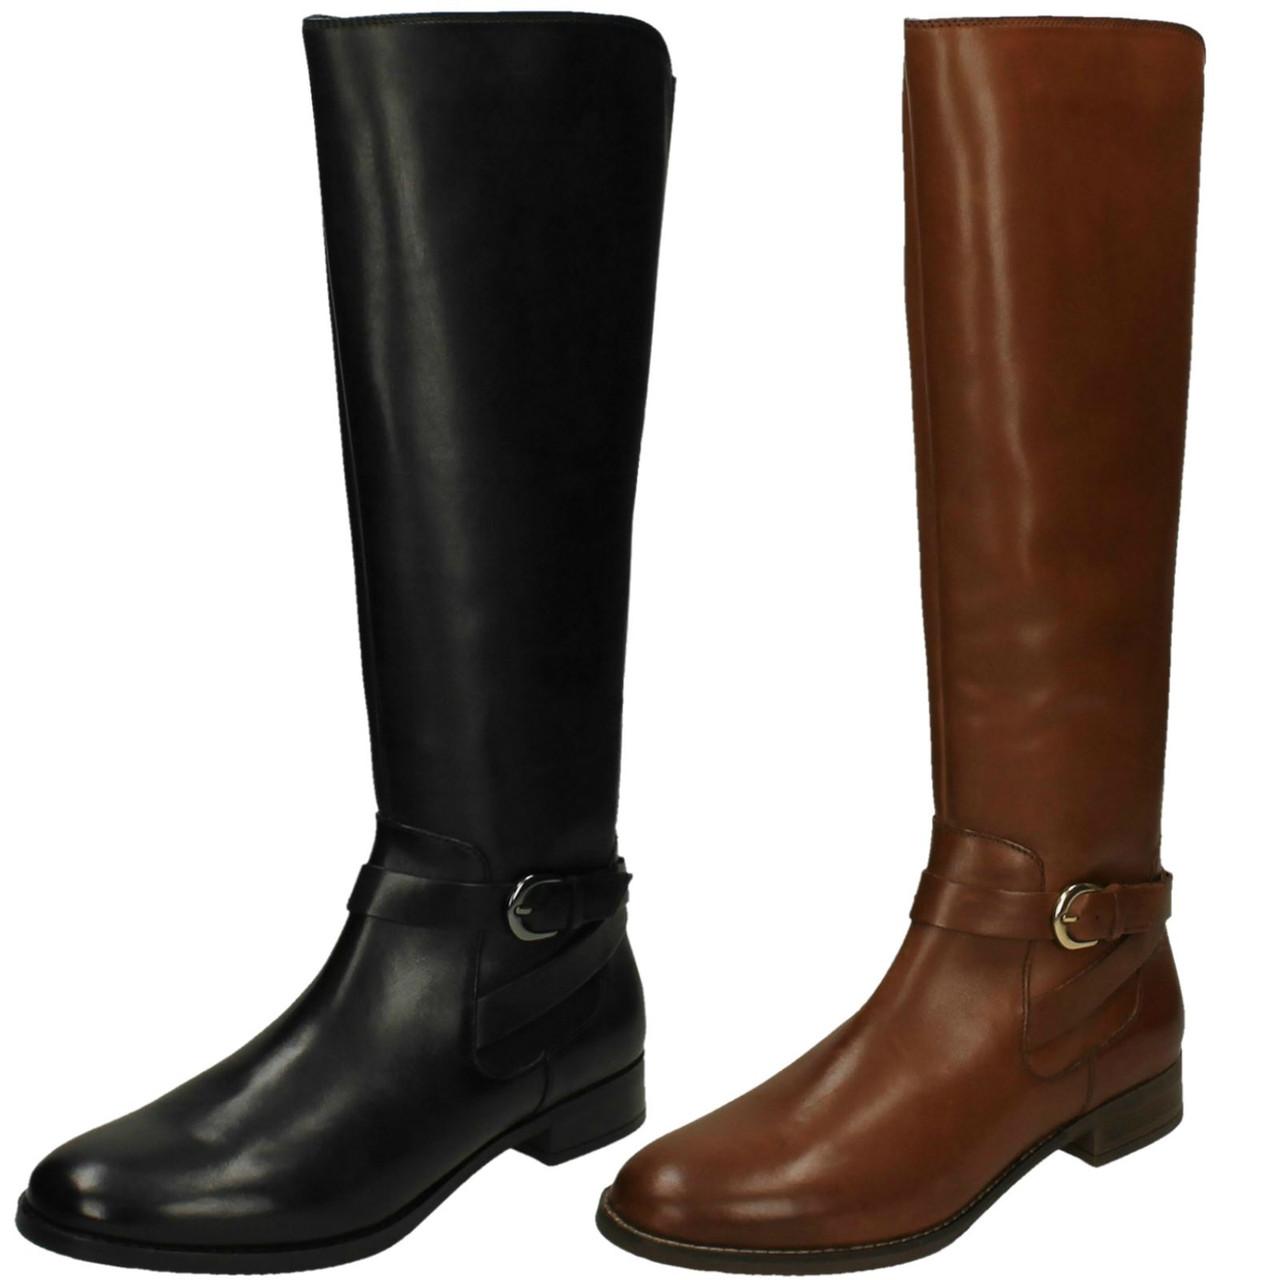 Ladies Clarks Knee High Boots Netley Whirl